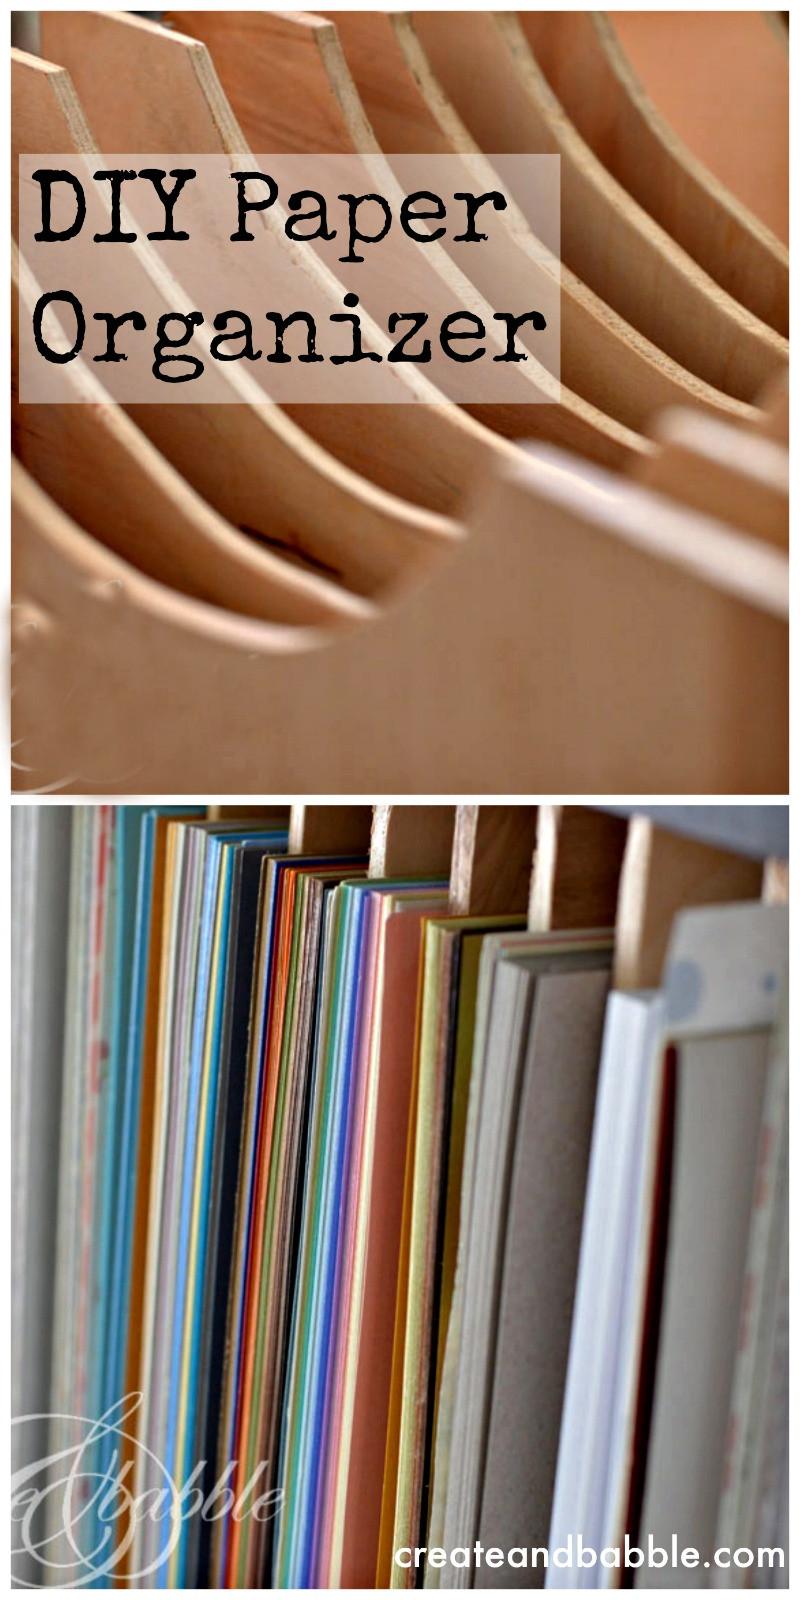 Paper Organizer DIY  DIY Paper Organizer Someday Crafts